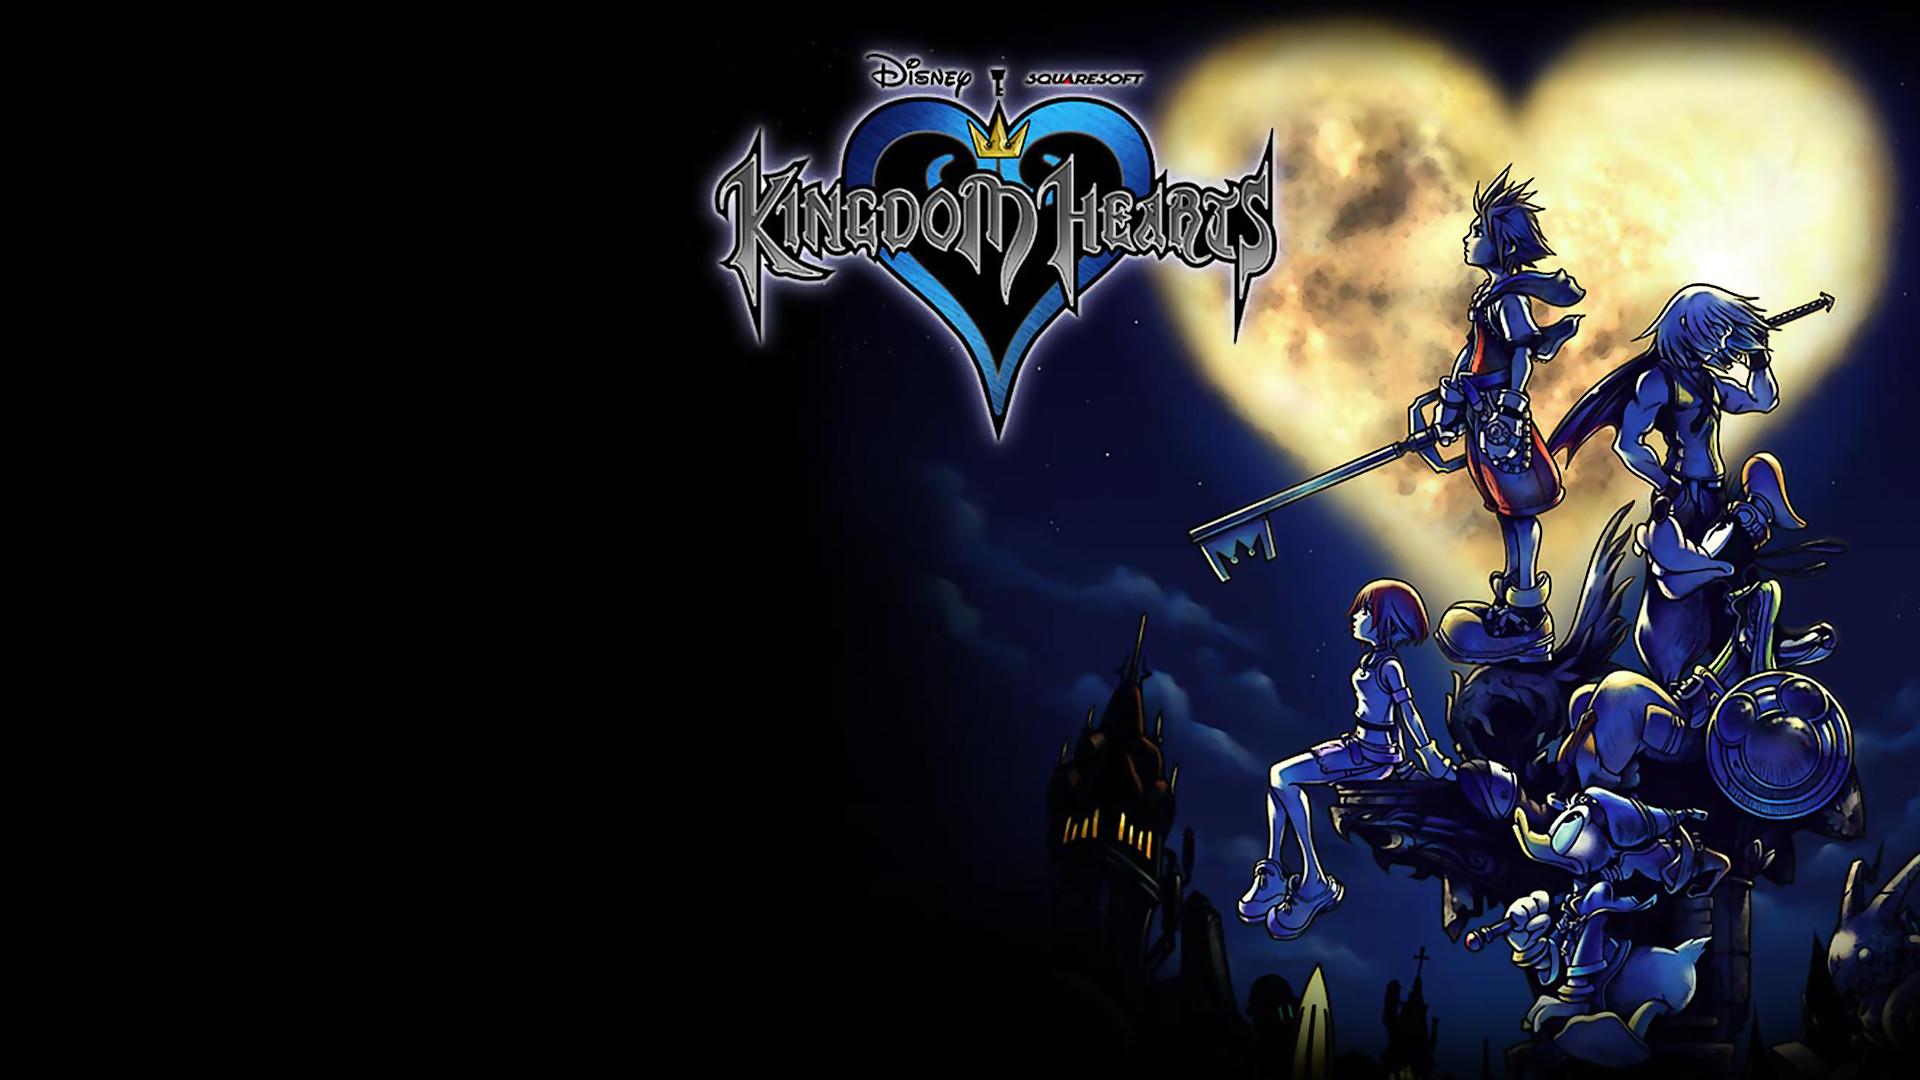 Kingdom Hearts Wallpaper Kingdom, Hearts